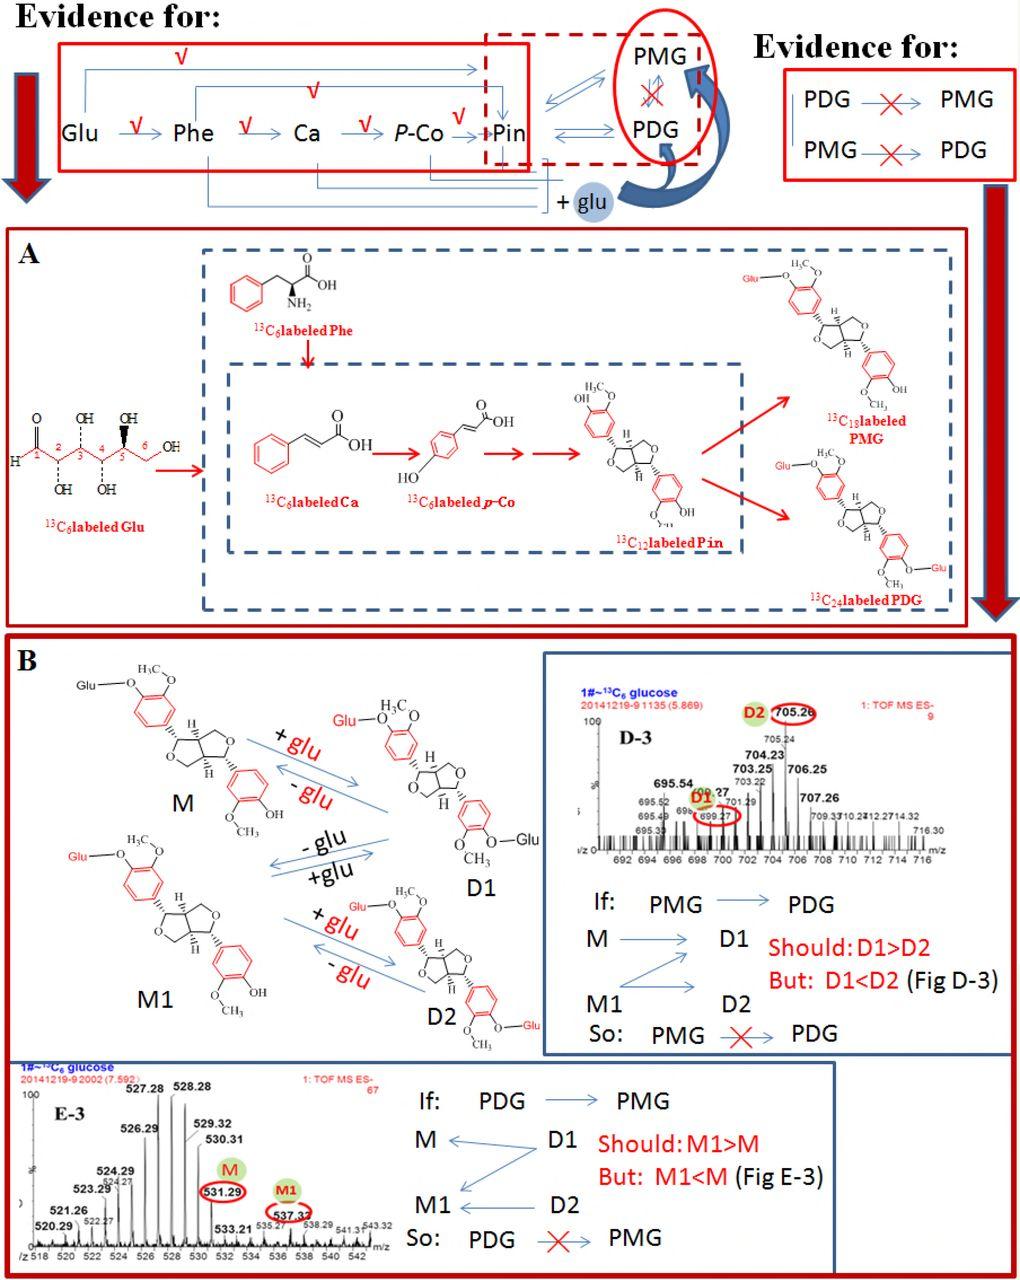 Verification of the phenylpropanoid pinoresinol biosynthetic pathway